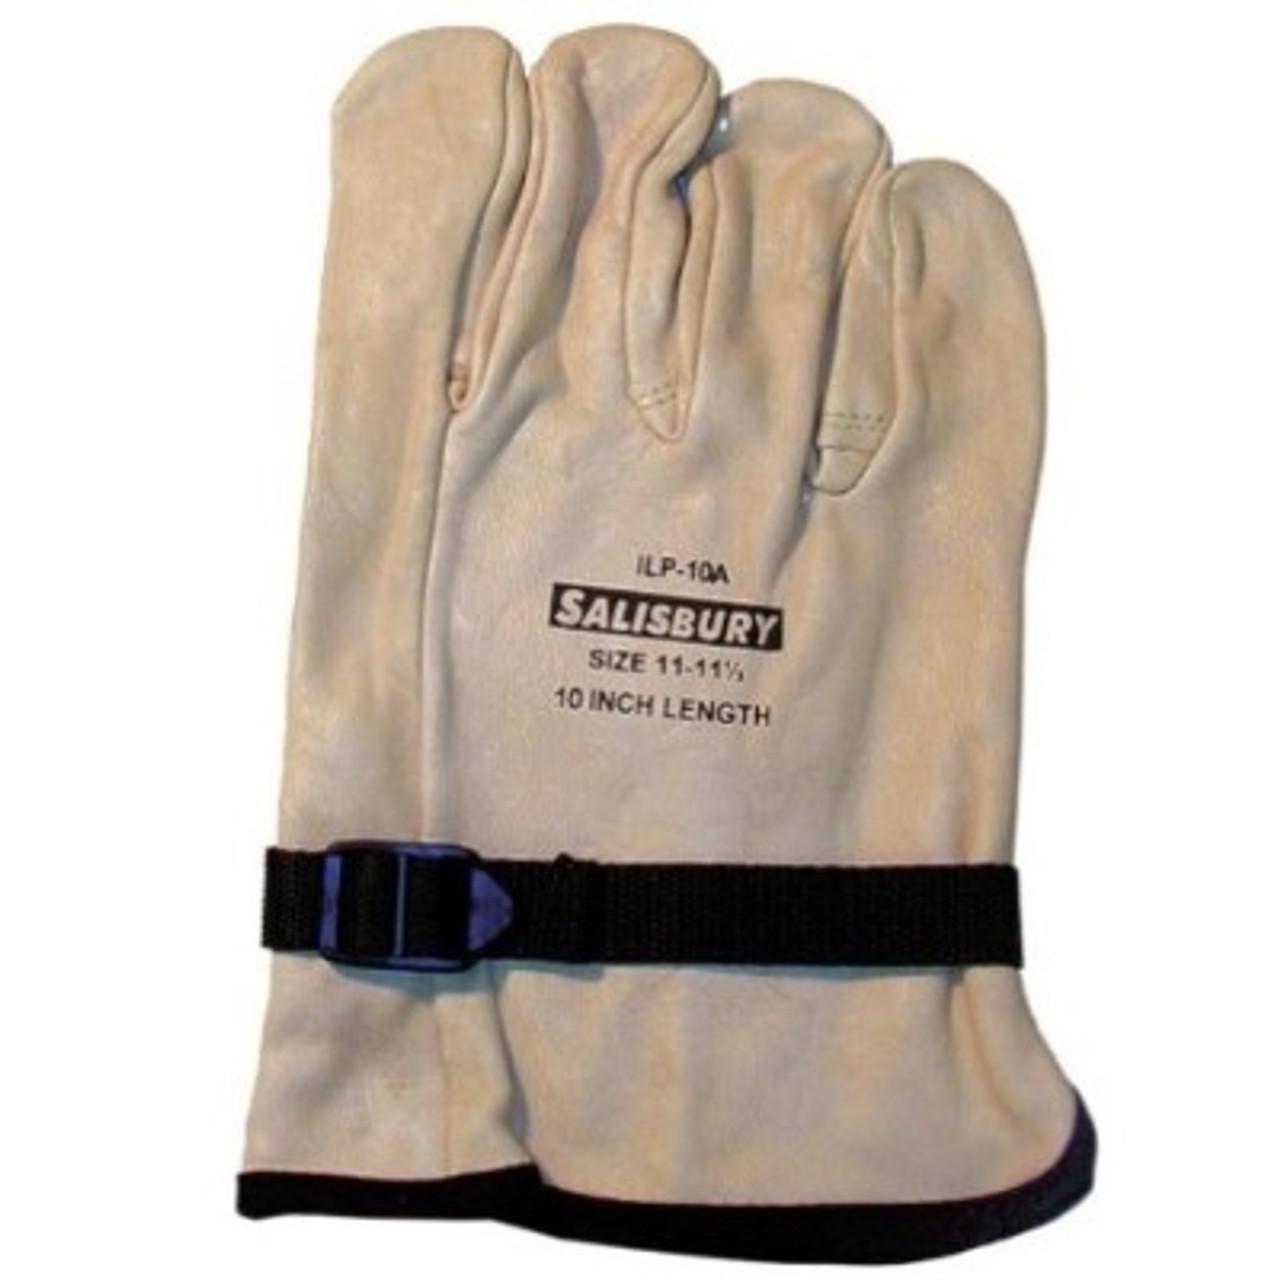 Premium Leather Protector Adjustable Size